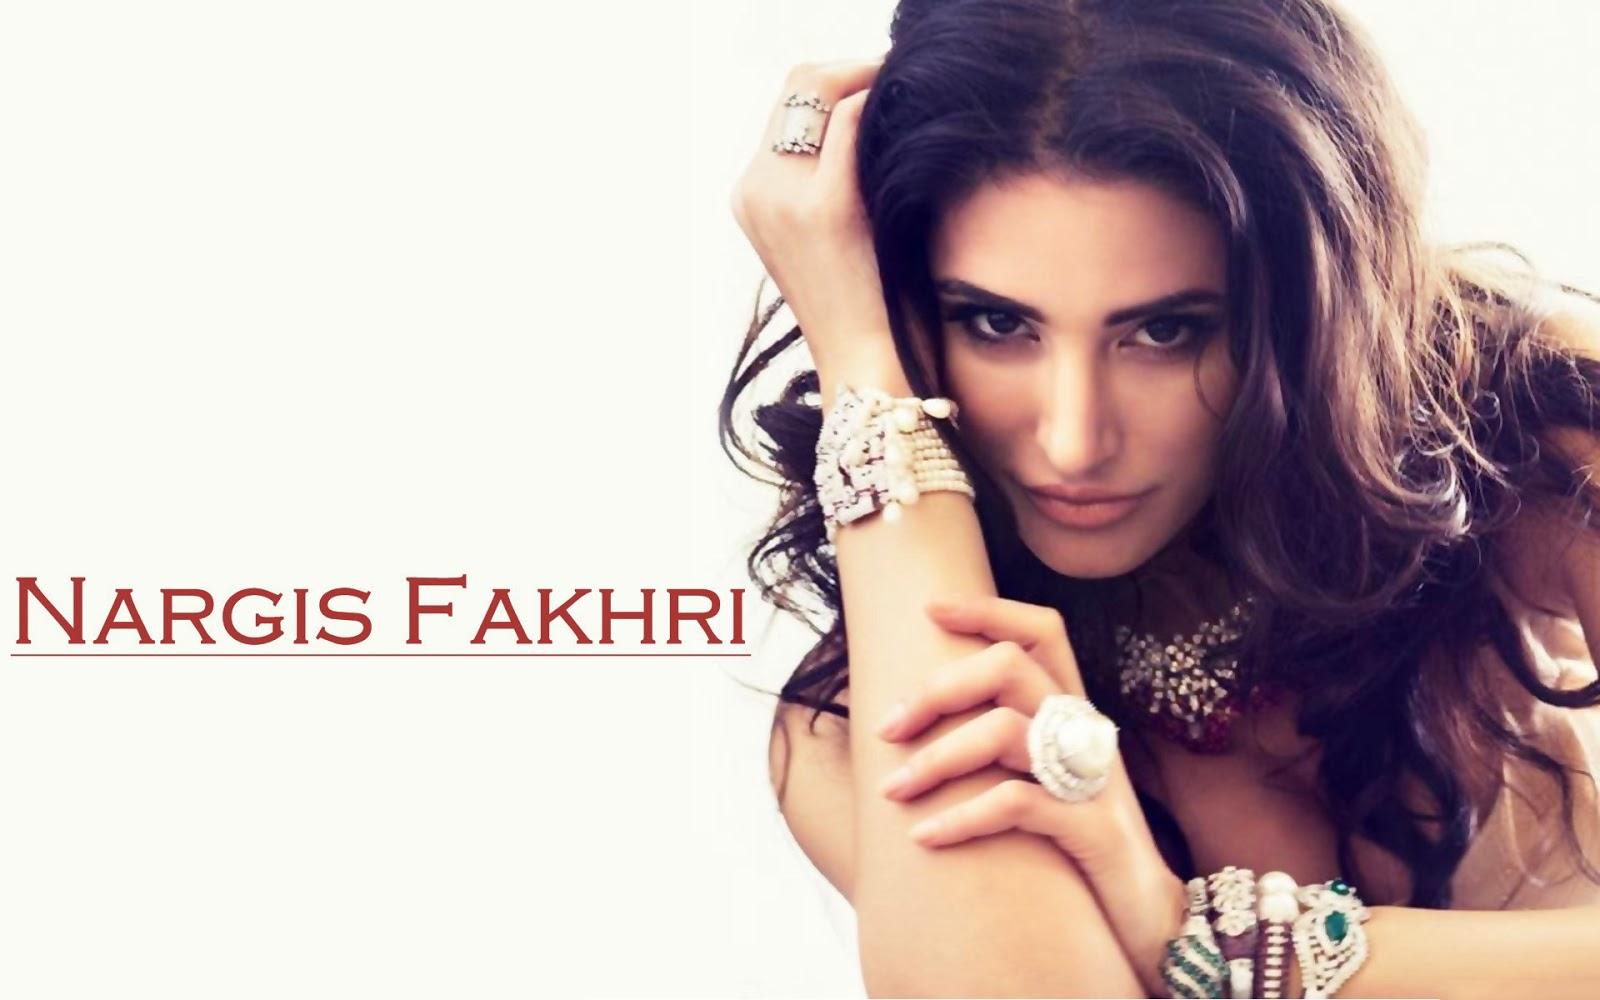 Celebrities Hd Wallpaper Download Nargis Fakhri Hd: HDwallpapersz: Dowload Free HD Wallpapers With High